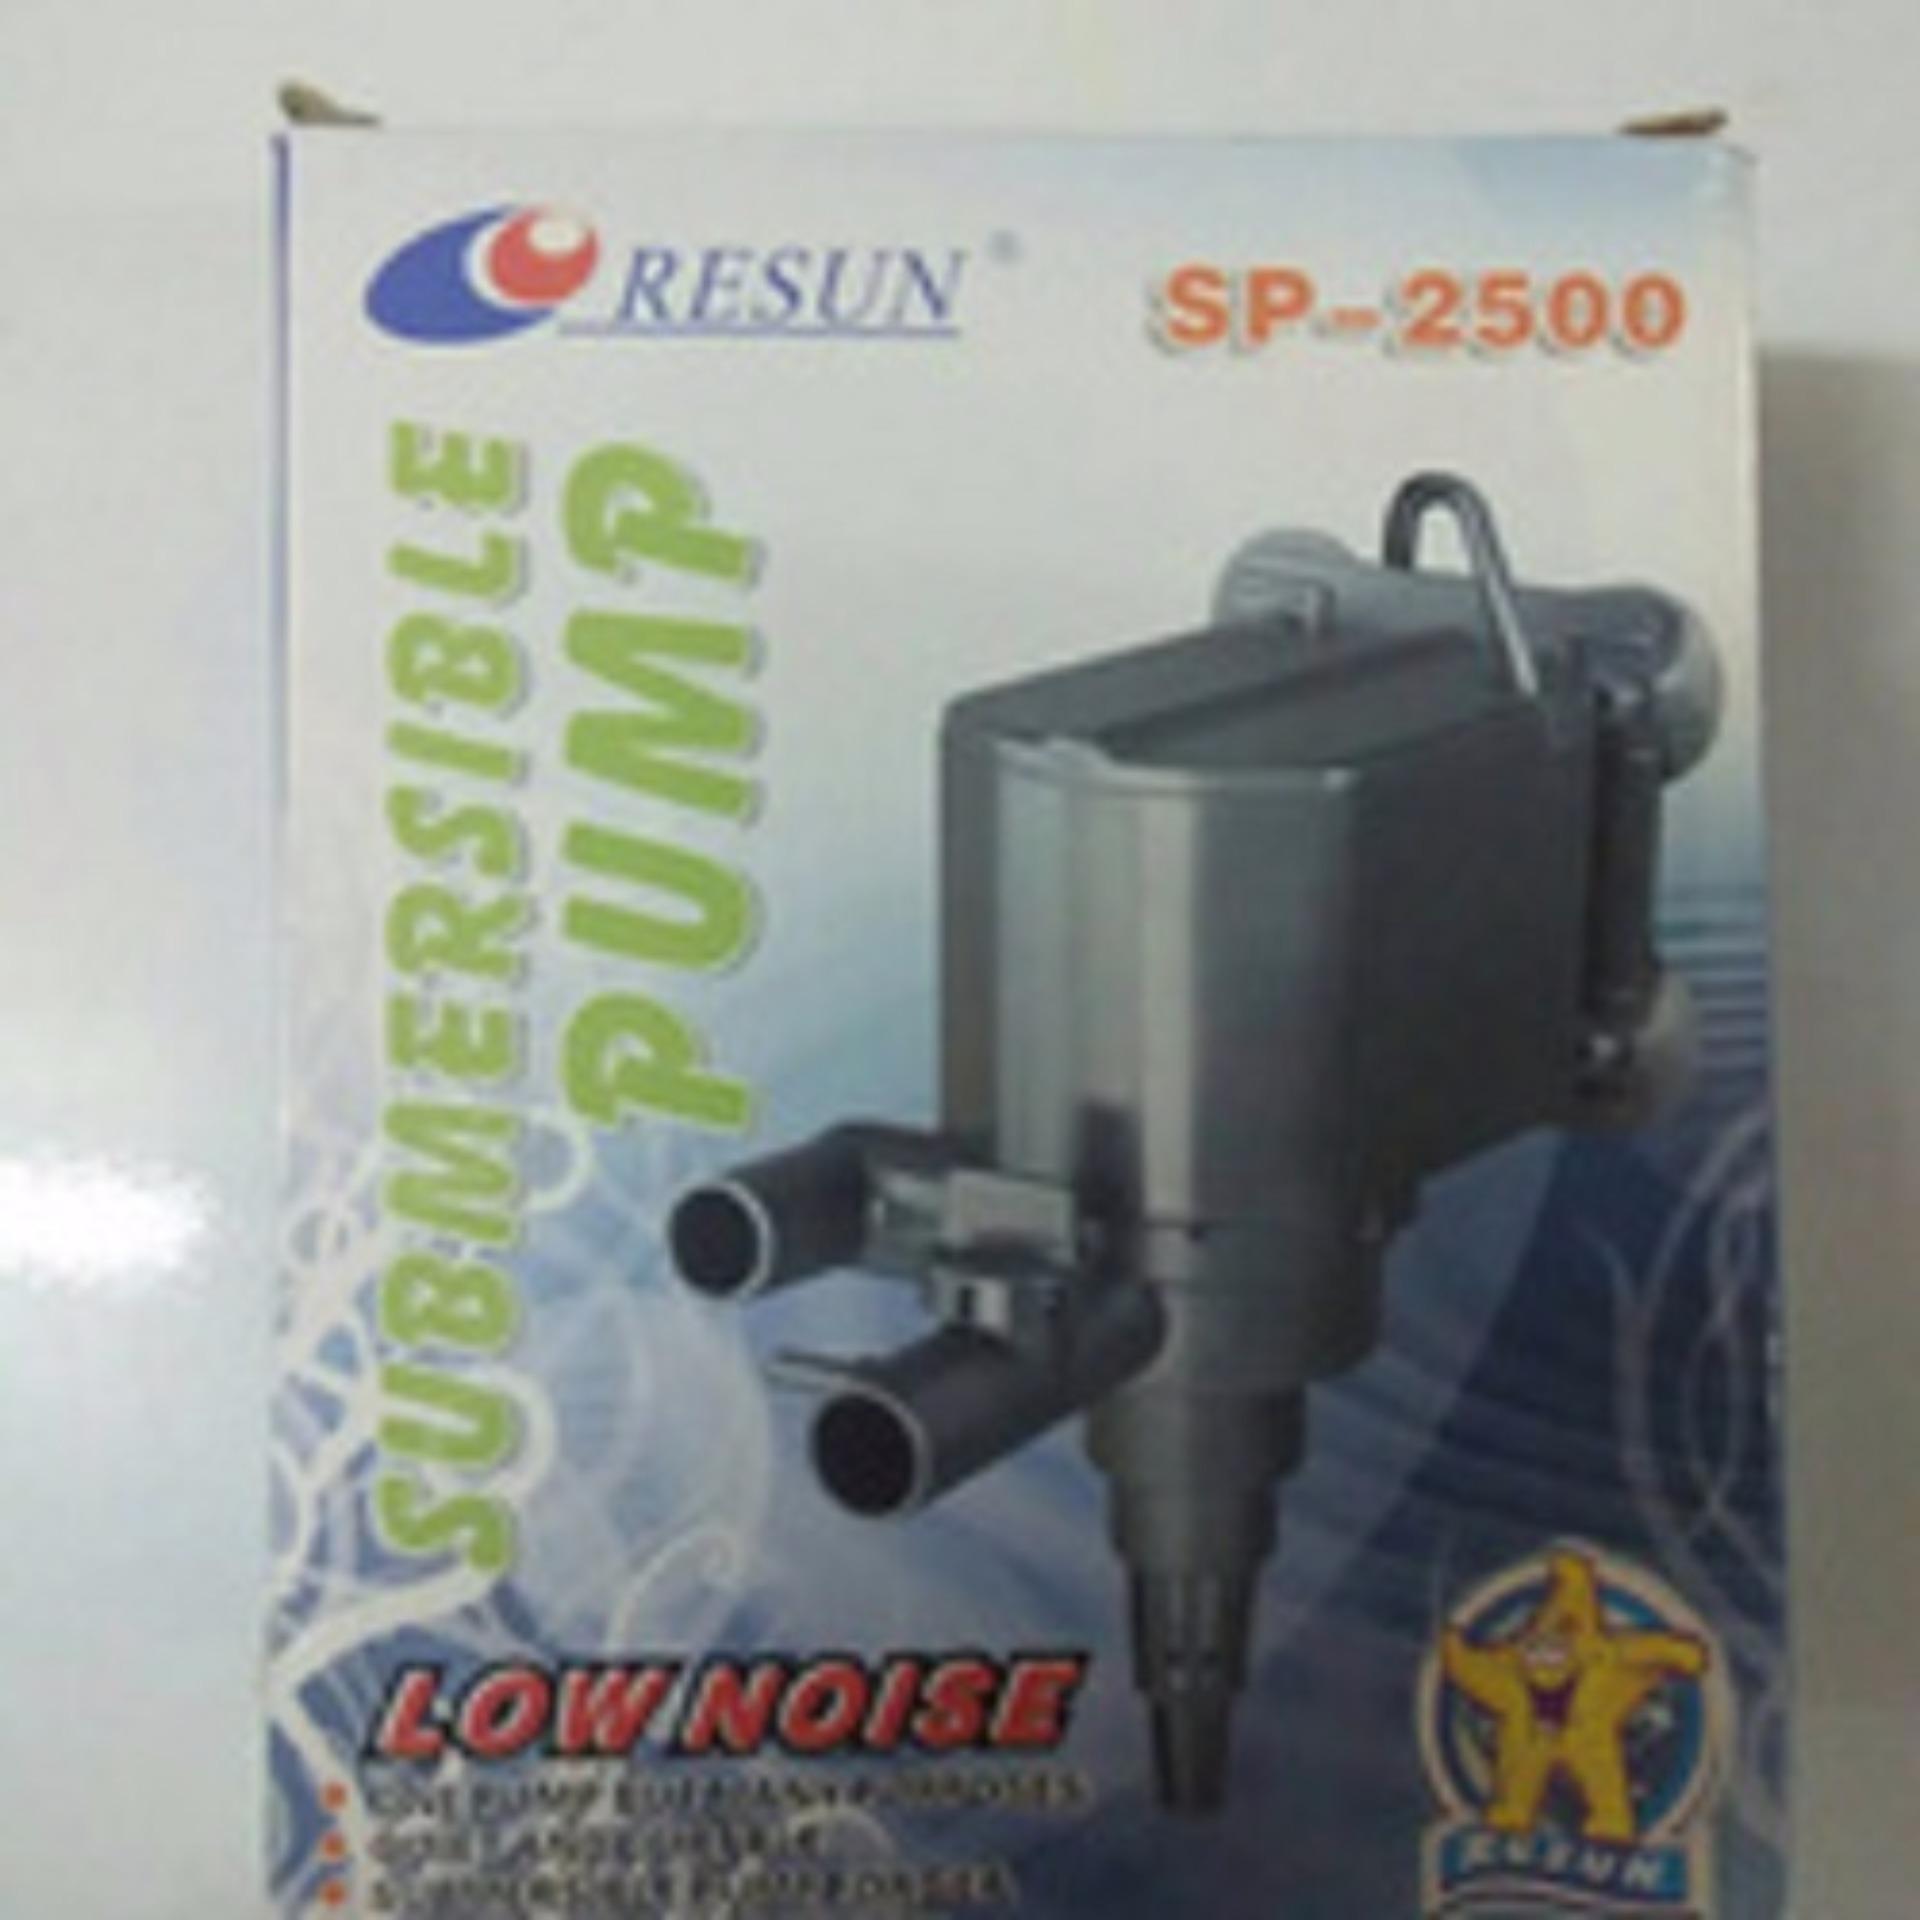 Sloof Power Head Resun SP-2500 : Mesin Pompa Air for Aquarium